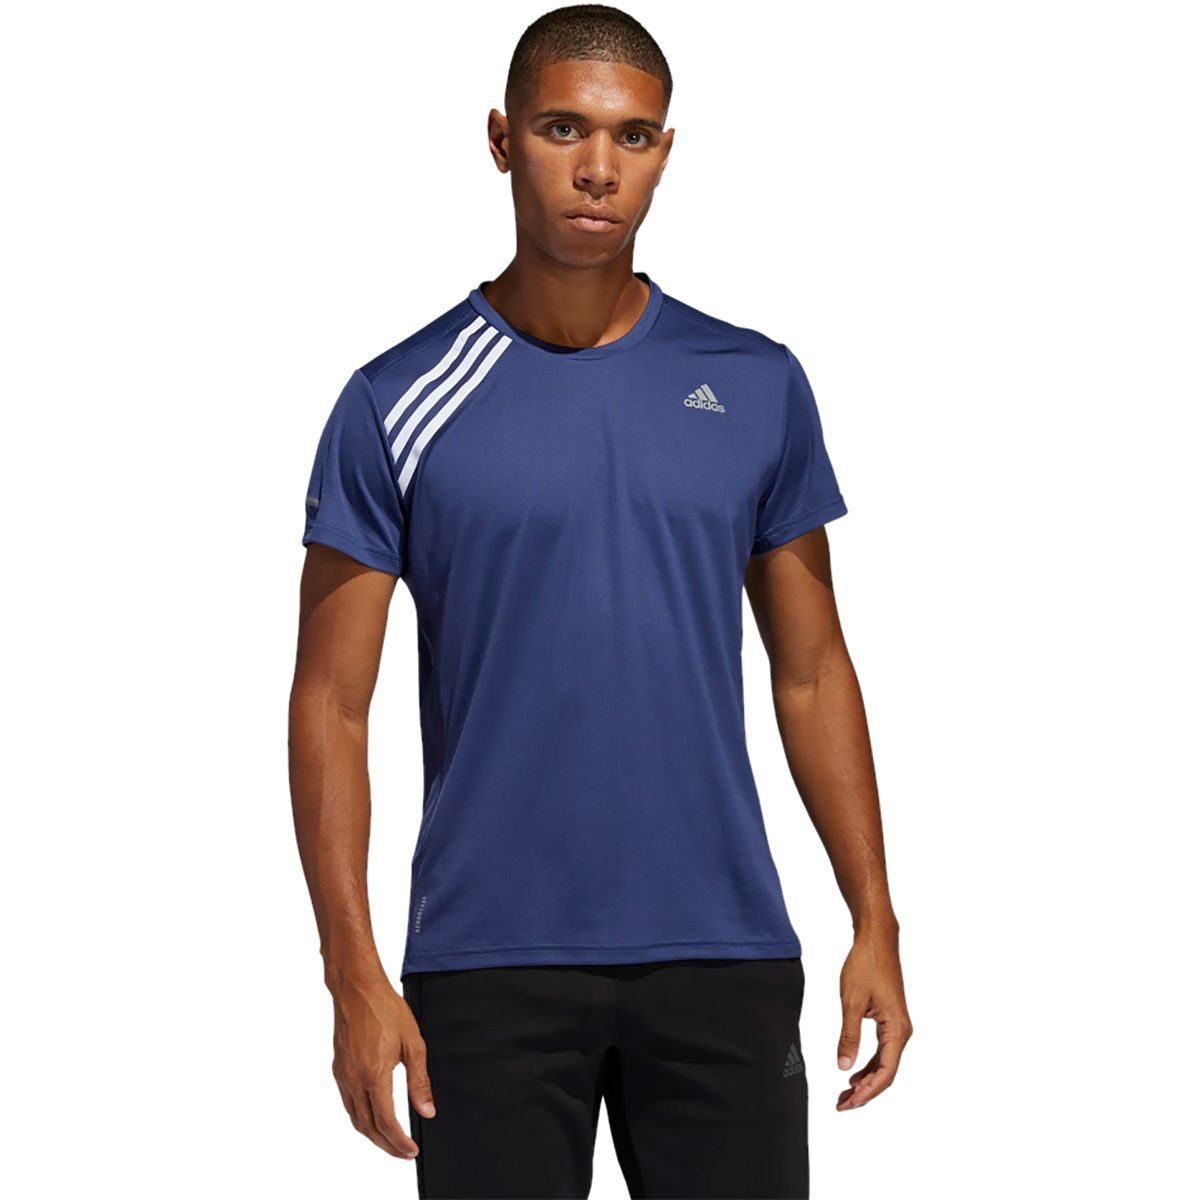 Adidas Own The Run T-Shirt - Men's   Shirts, Mens shirts, Running ...